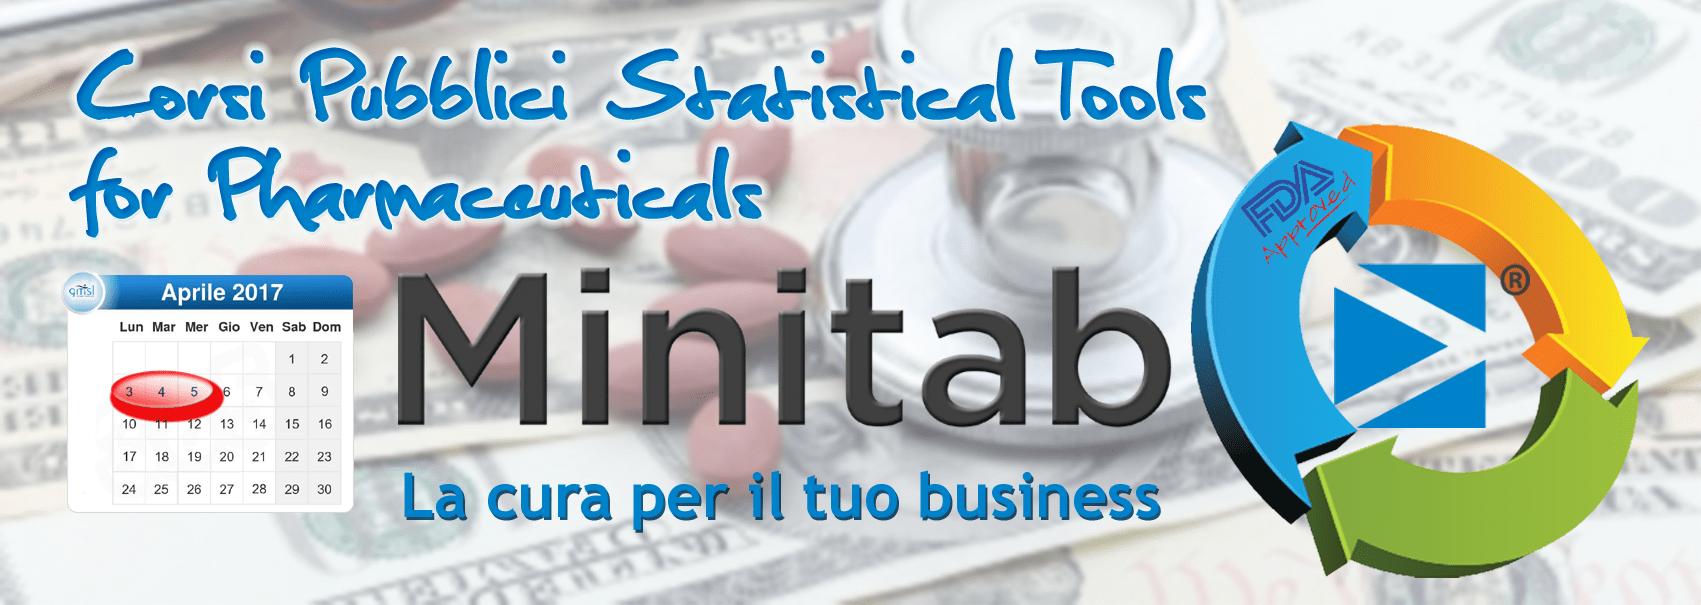 Corsi_Pharma Minitab - Corsi Pubblici Statistical Tools for Pharmaceuticals. Firenze, 3 - 5 Aprile 2017